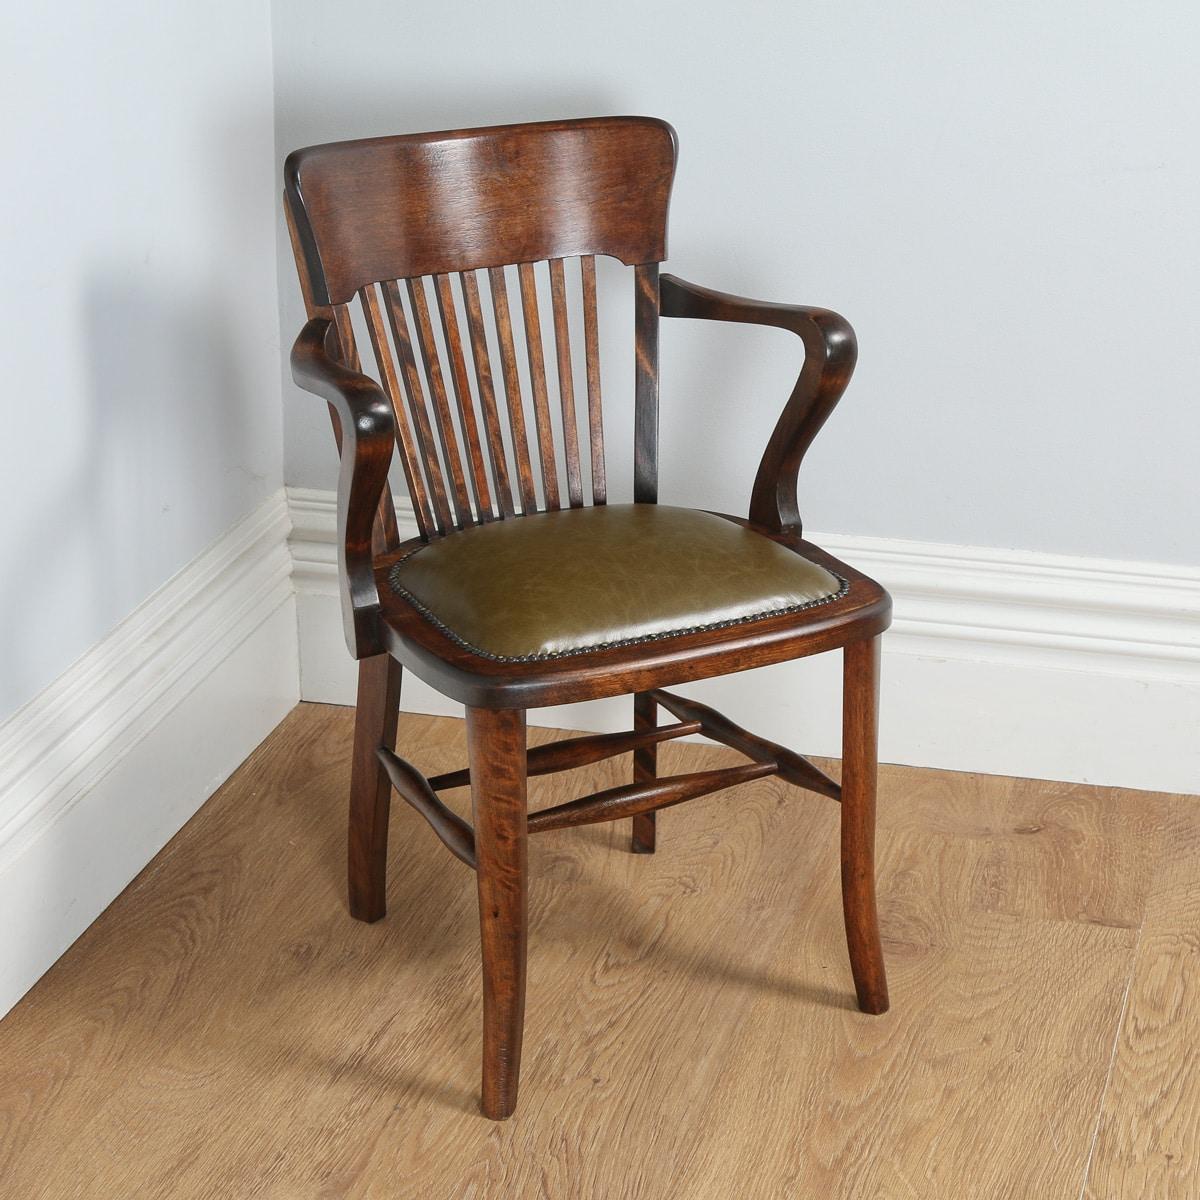 Antique Edwardian Beech Green Leather Office Desk Chair Circa 1910 Yolagray